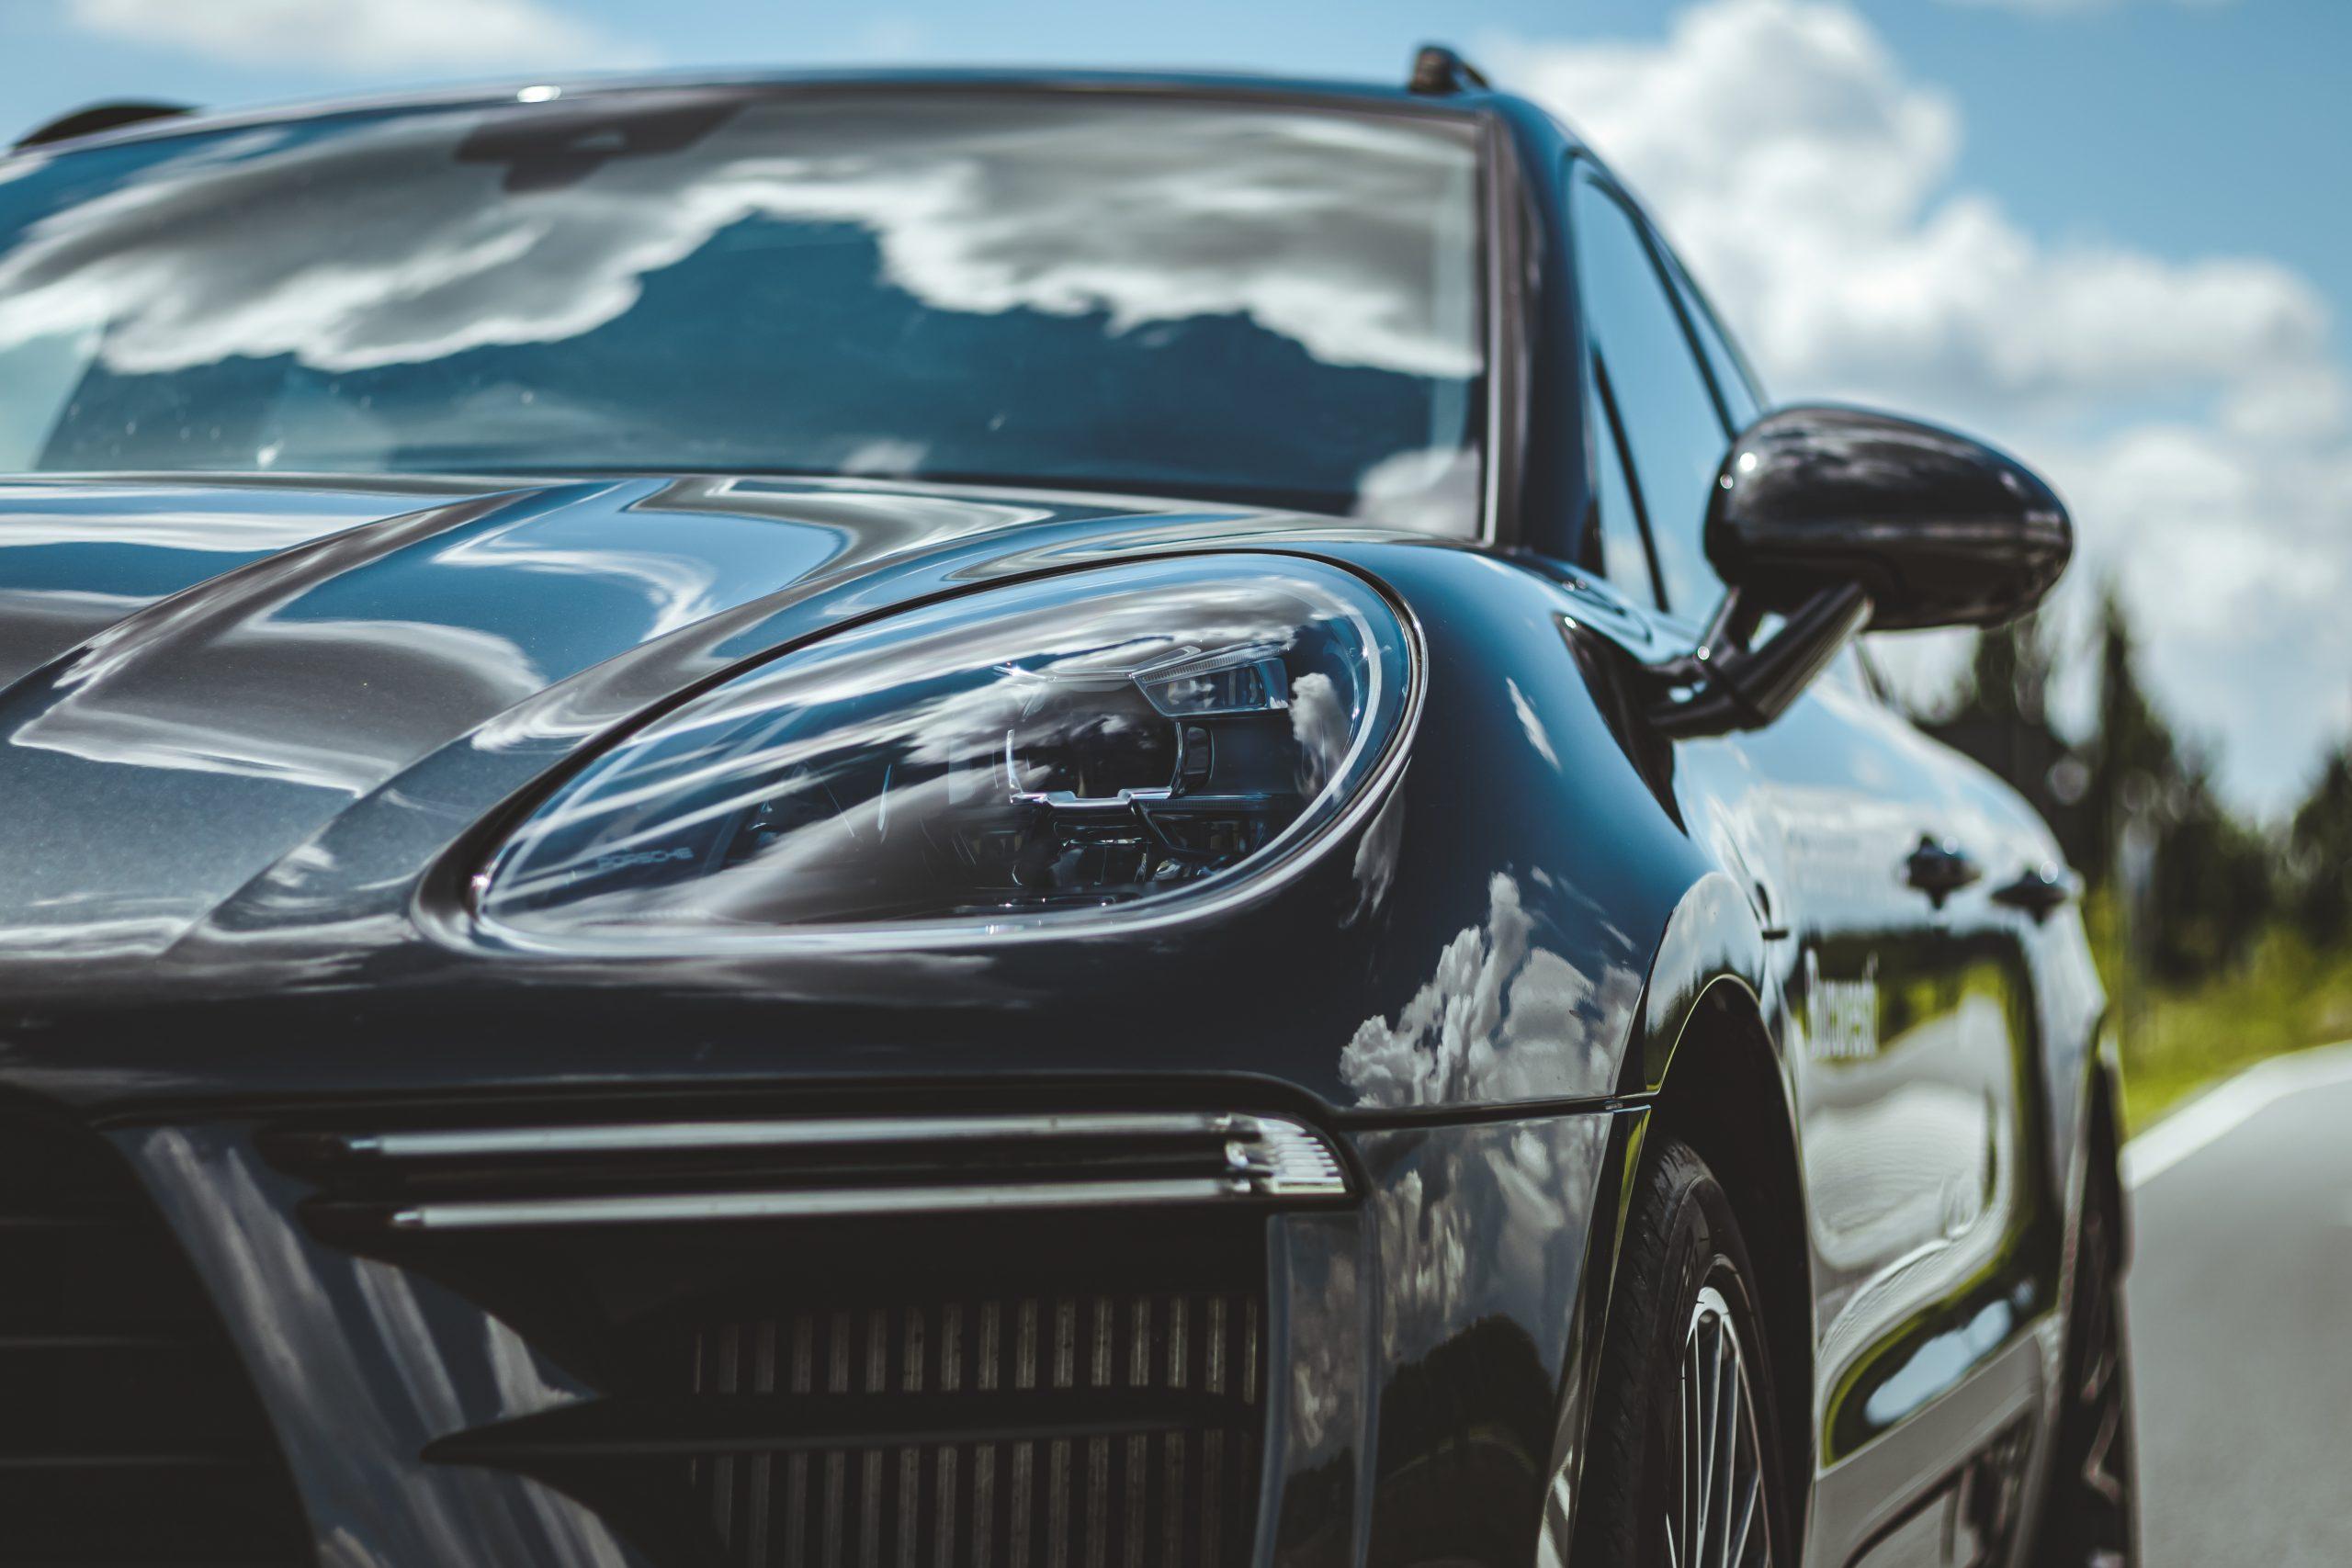 shiny black porsche cayenne headlights